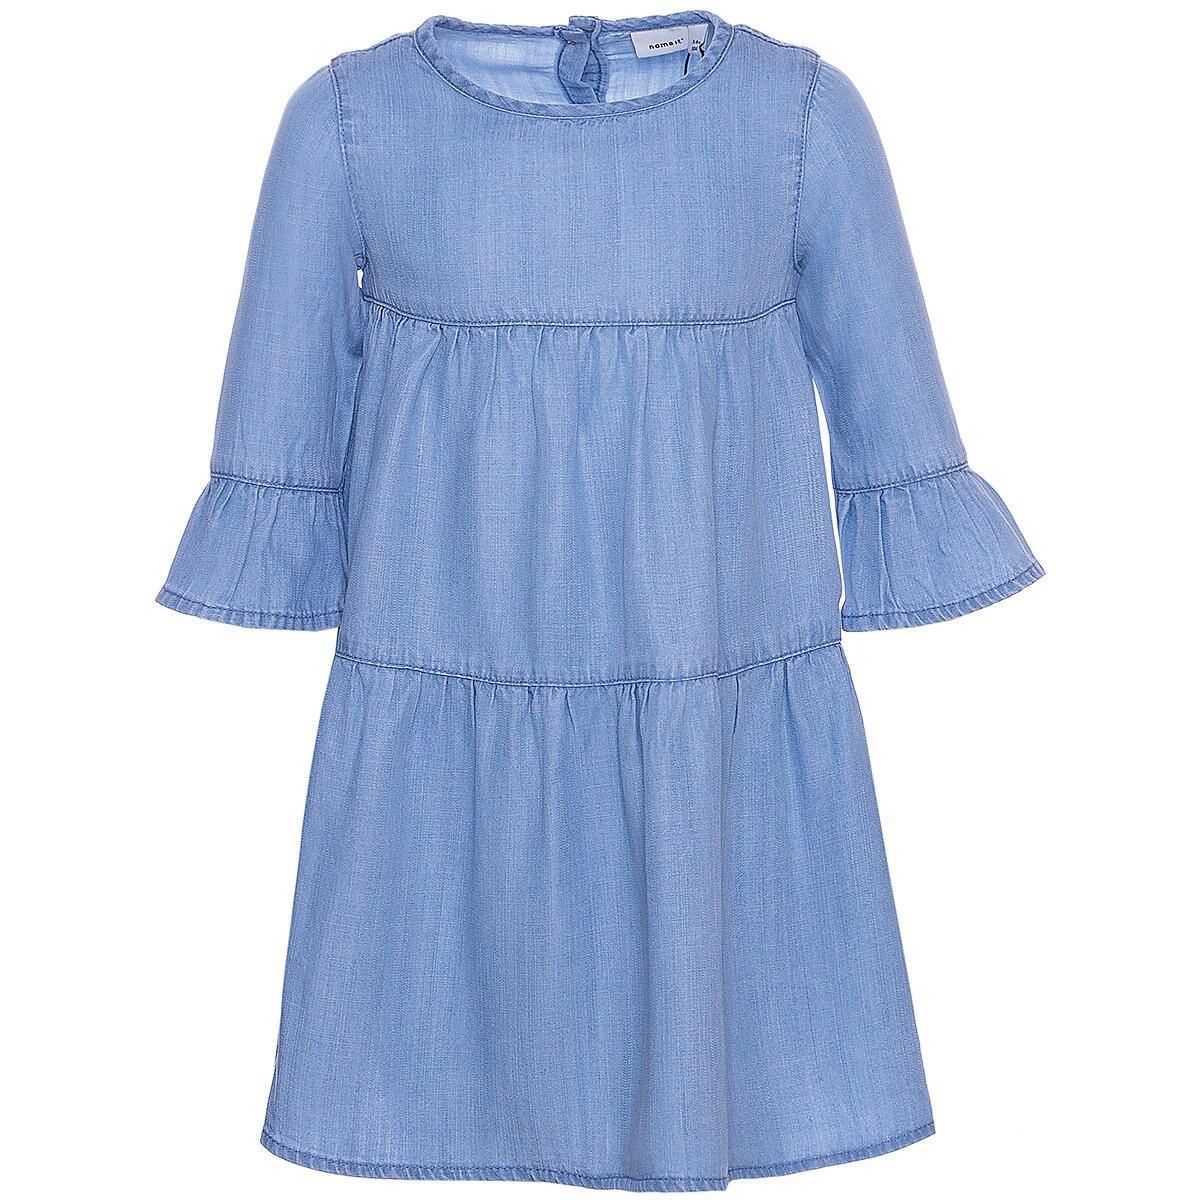 Фото - NAME IT Dresses 10624831 dress for girls baby clothing name it dresses 10626724 dress for girls baby clothing